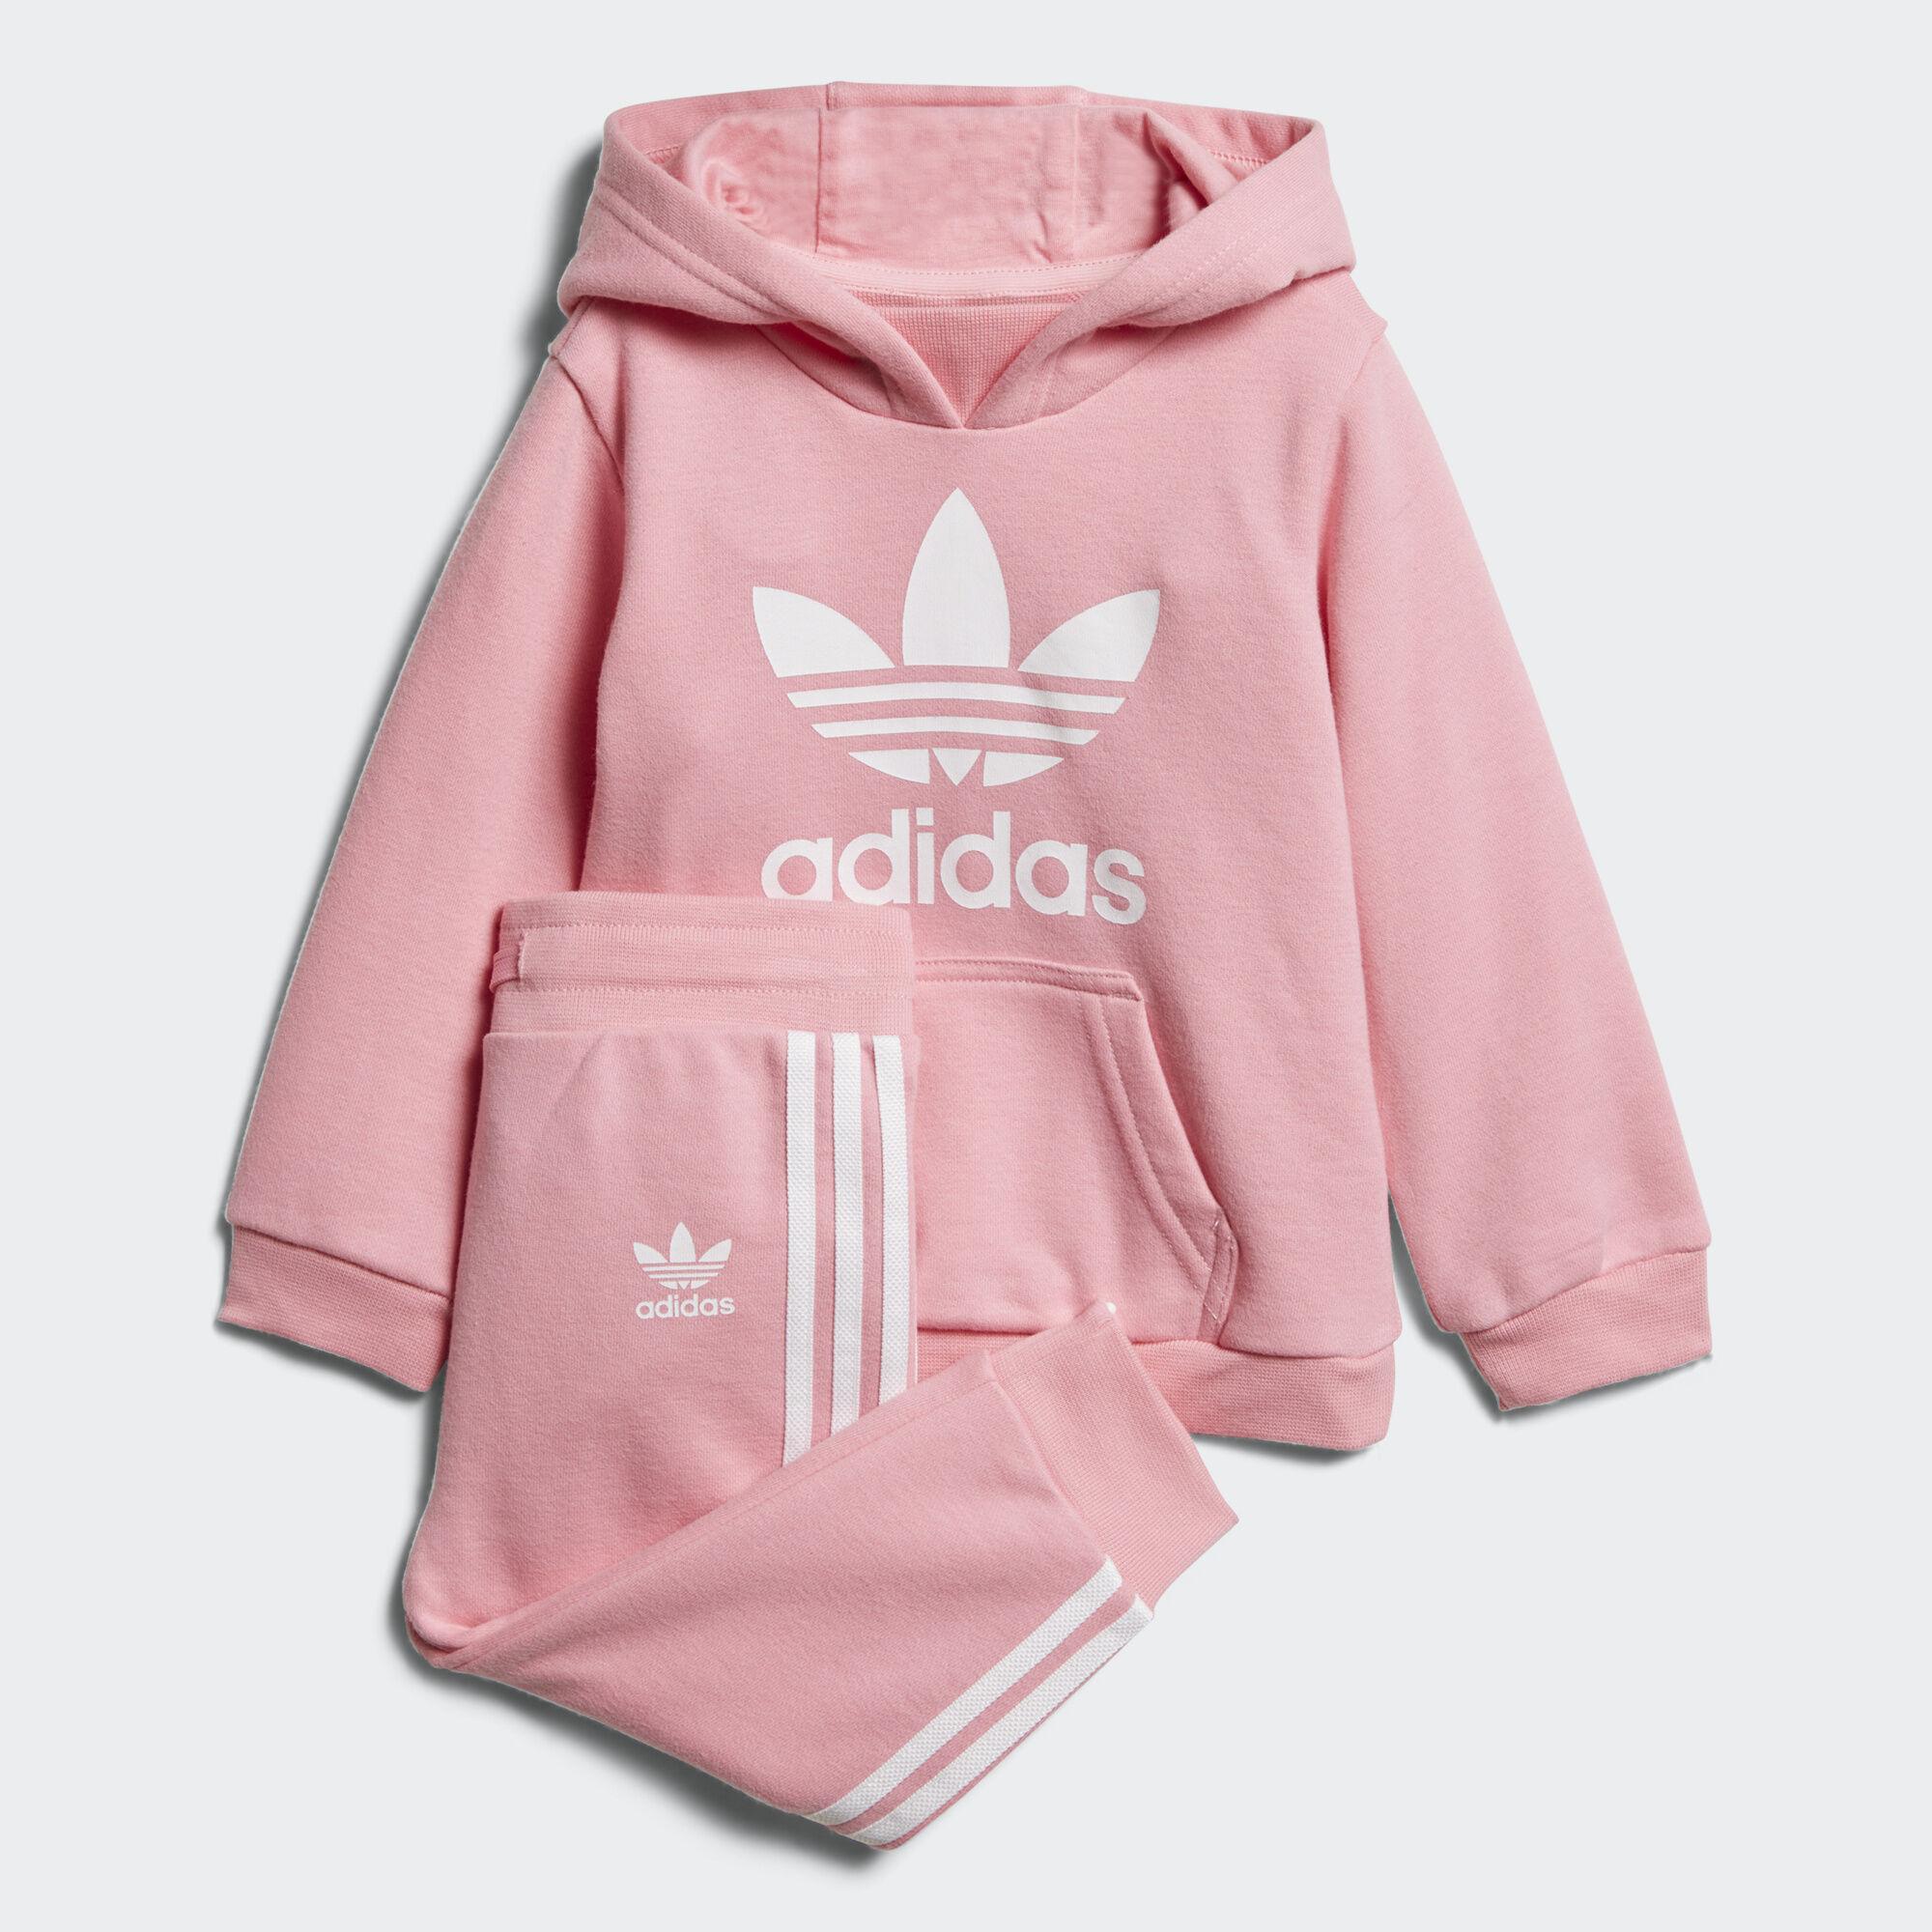 Adidas Trefoil Hoodie Set Pink Adidas Asia Middle East